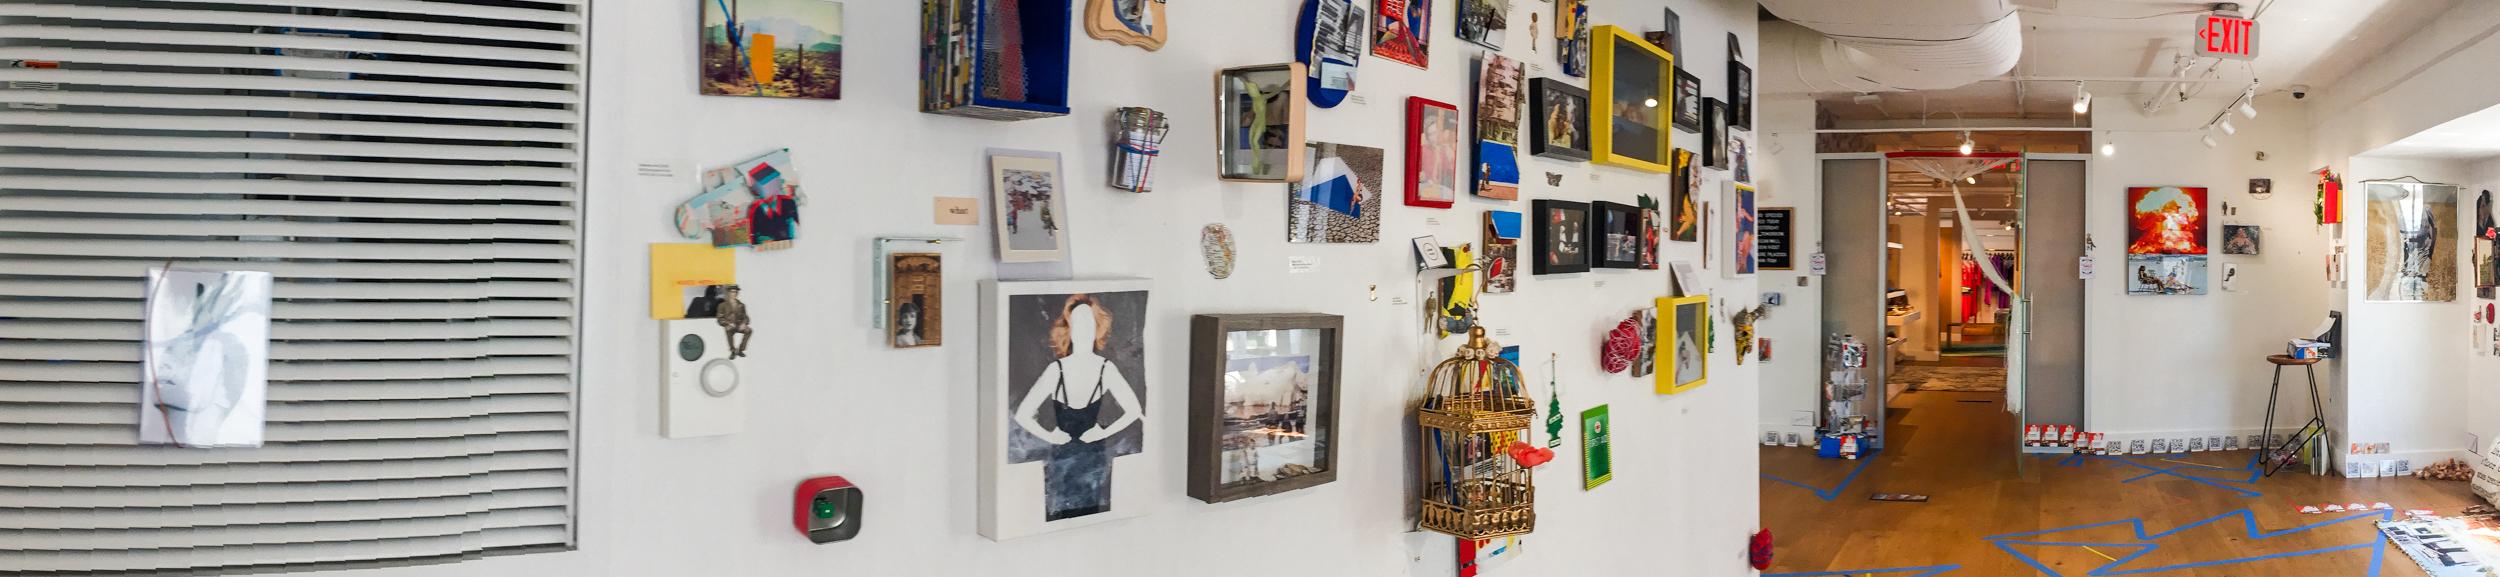 Faena-Exhibition-Images-149.jpg